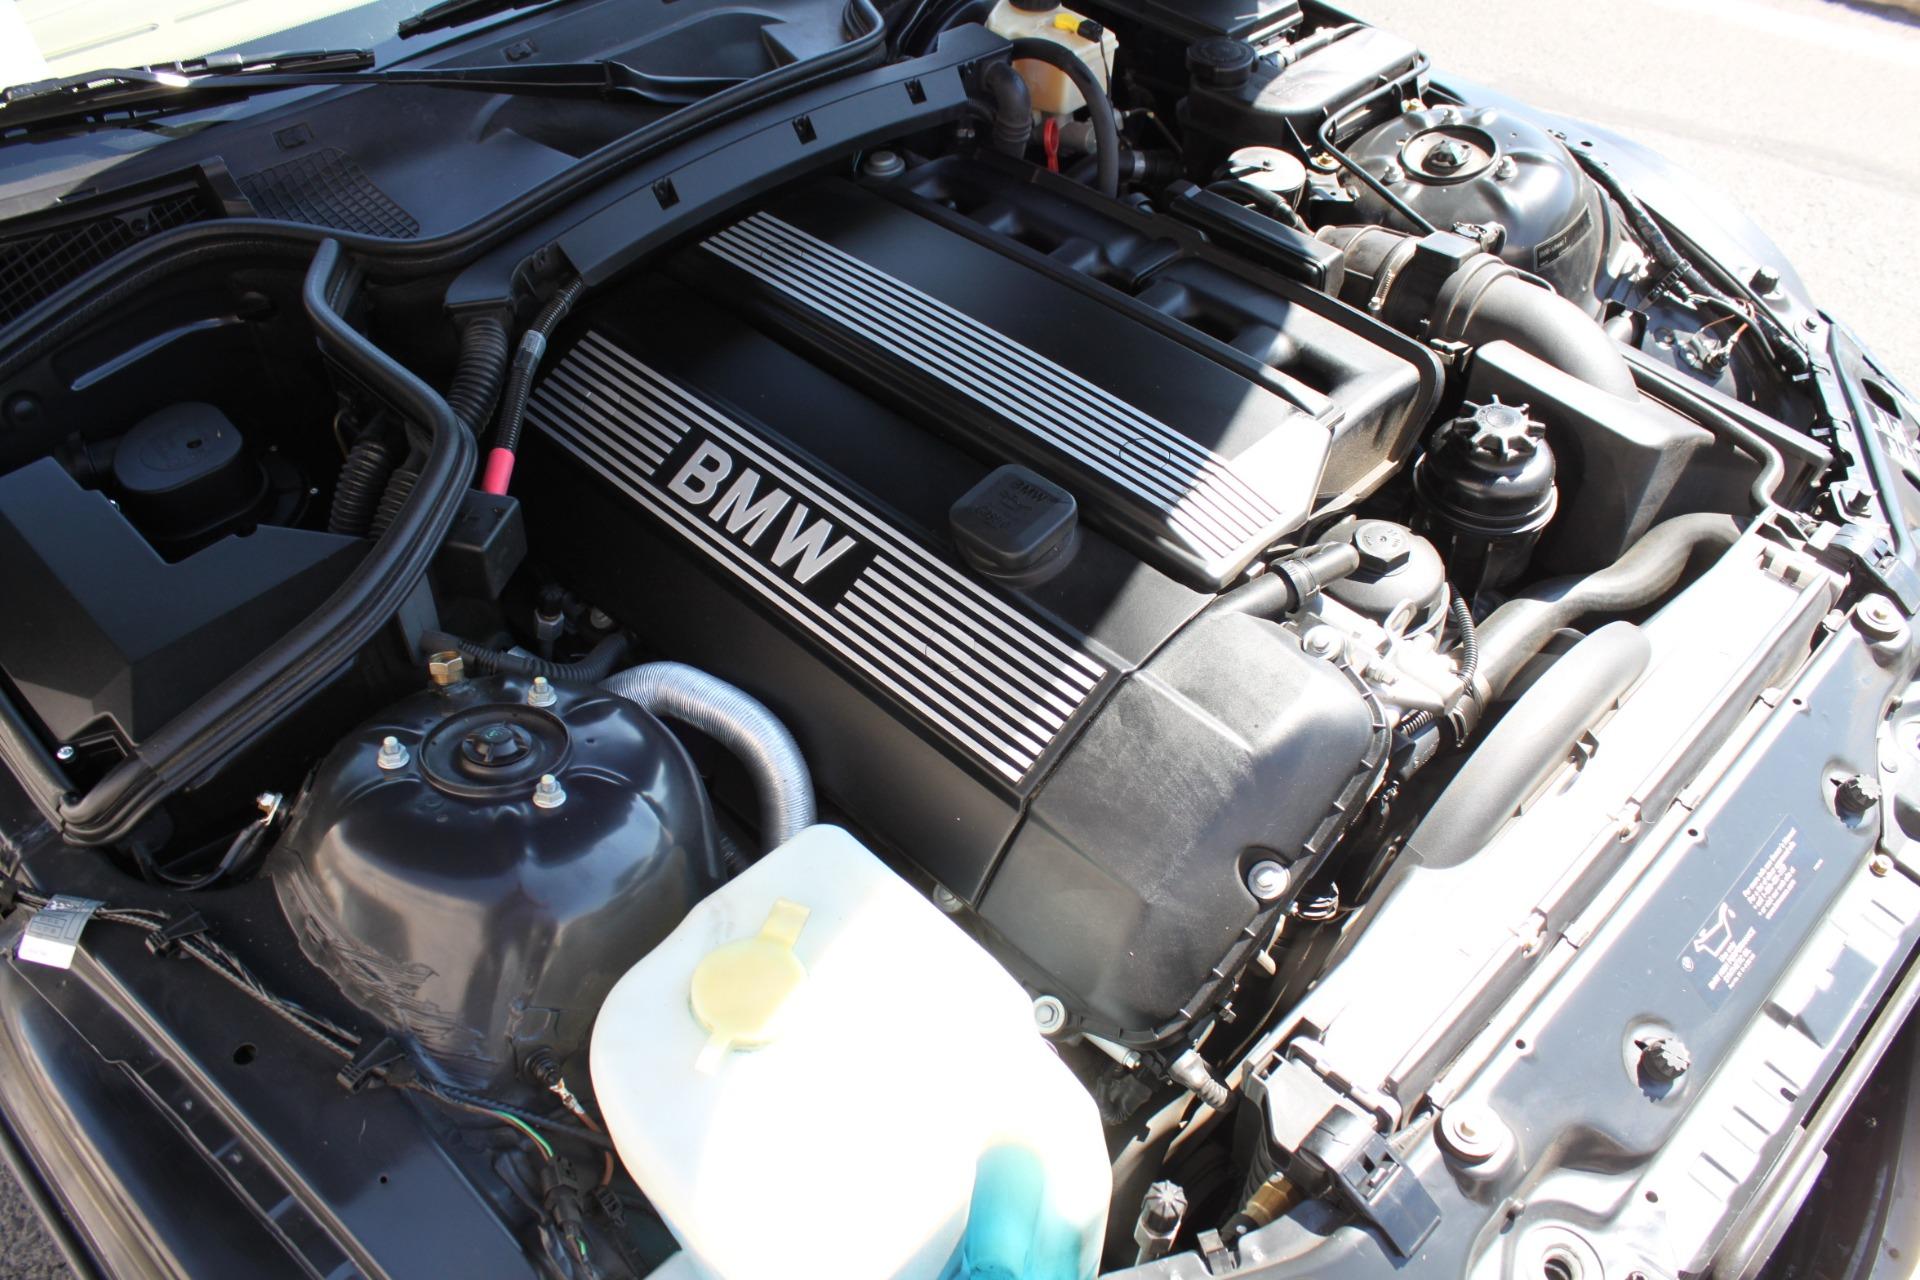 Used-2001-BMW-Z3-30i-Roadster-Mercedes-Benz